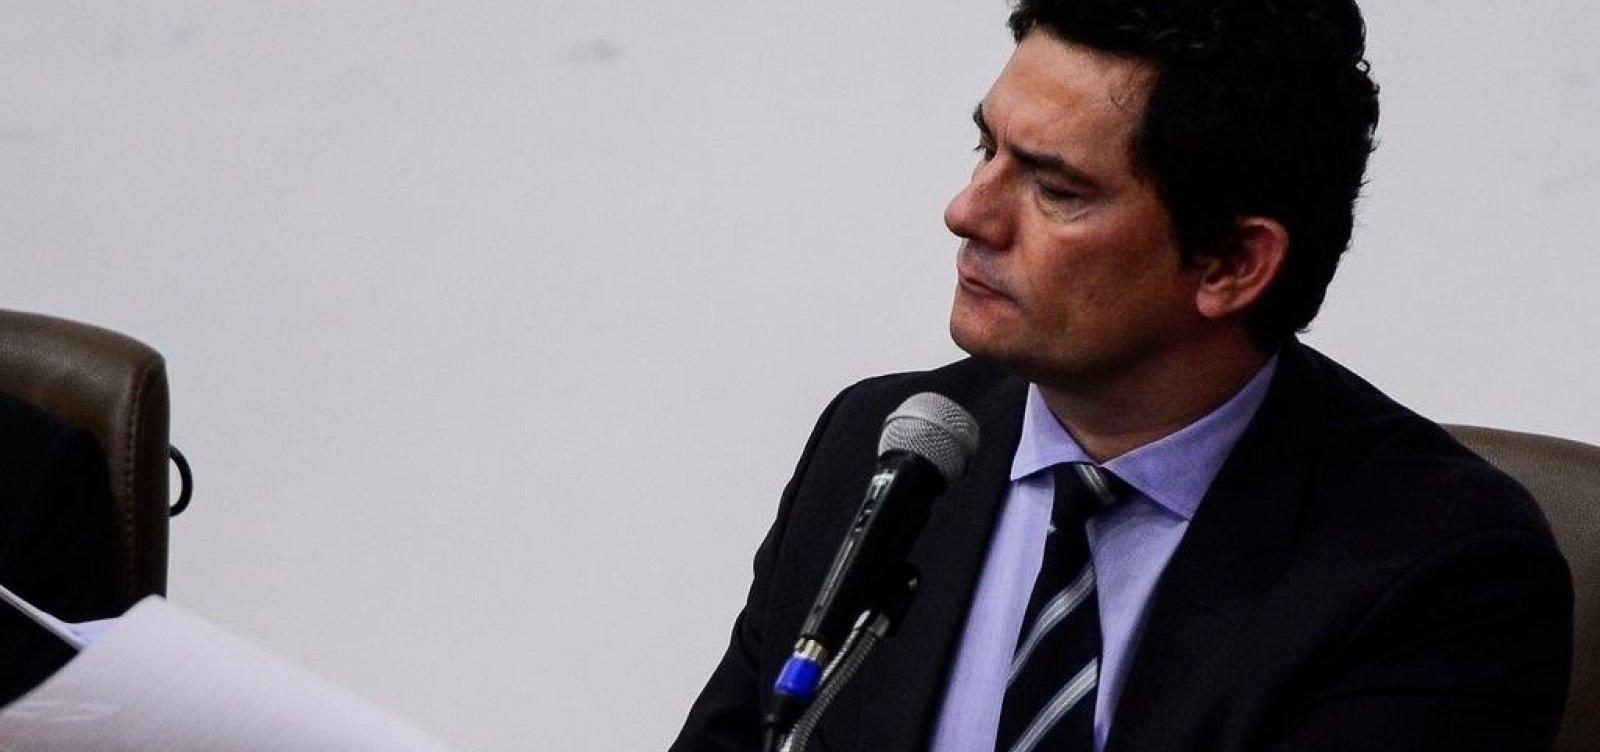 [Vaza depoimento de Sergio Moro à Polícia Federal; veja na íntegra]